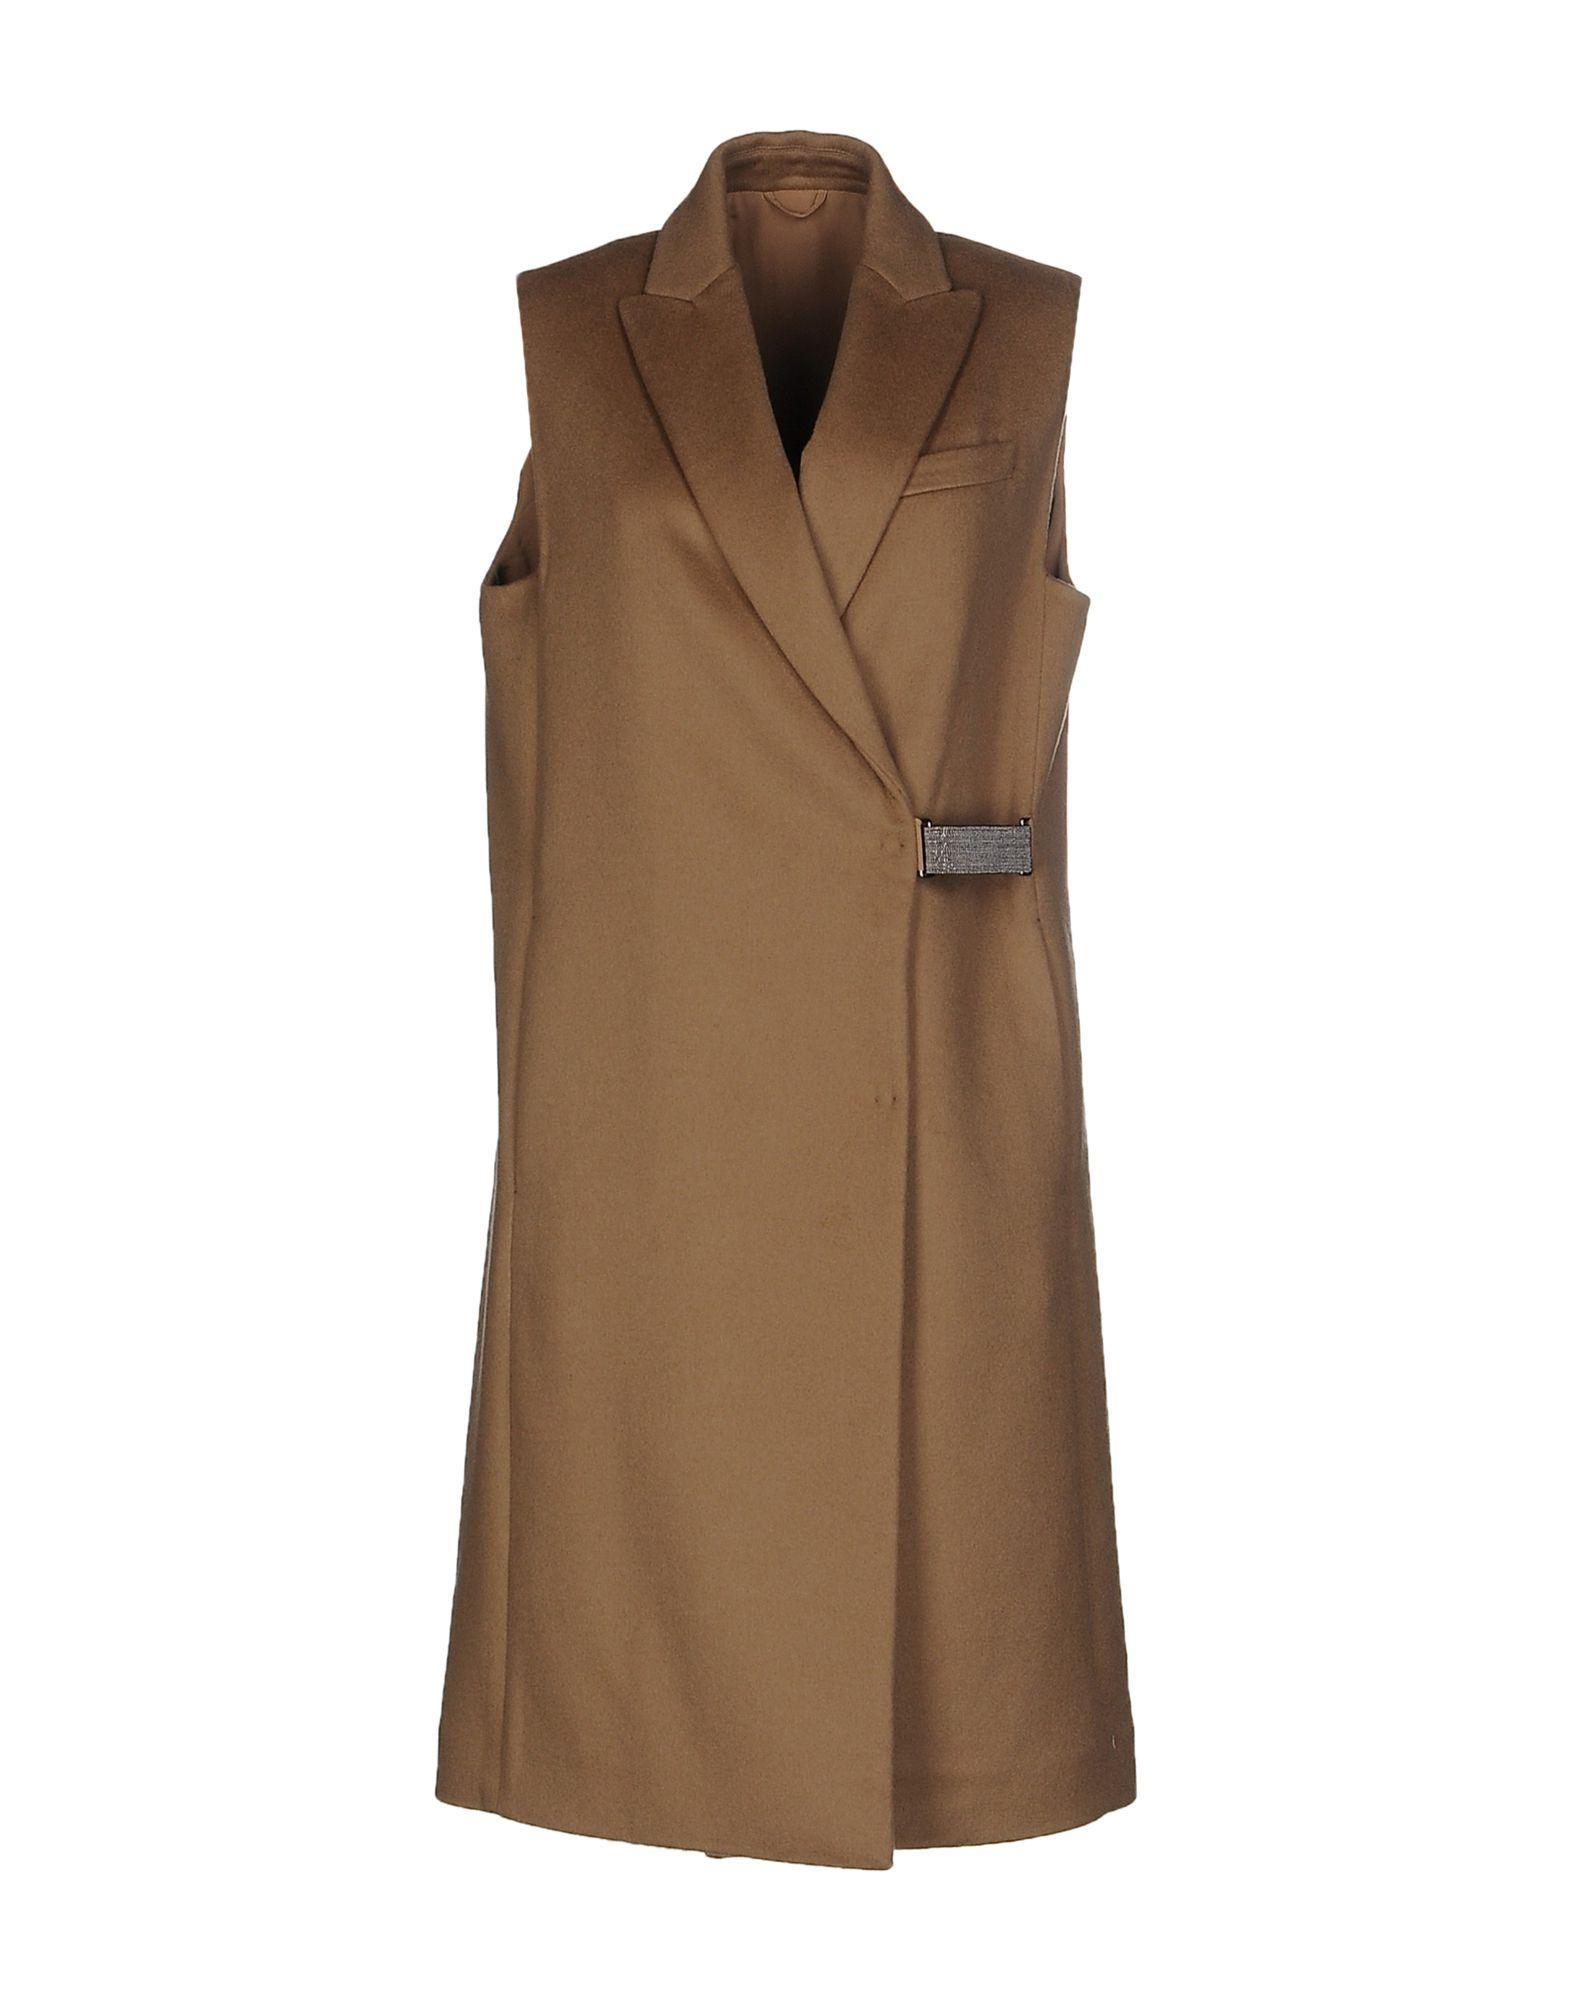 Brunello Cucinelli Coats In Camel